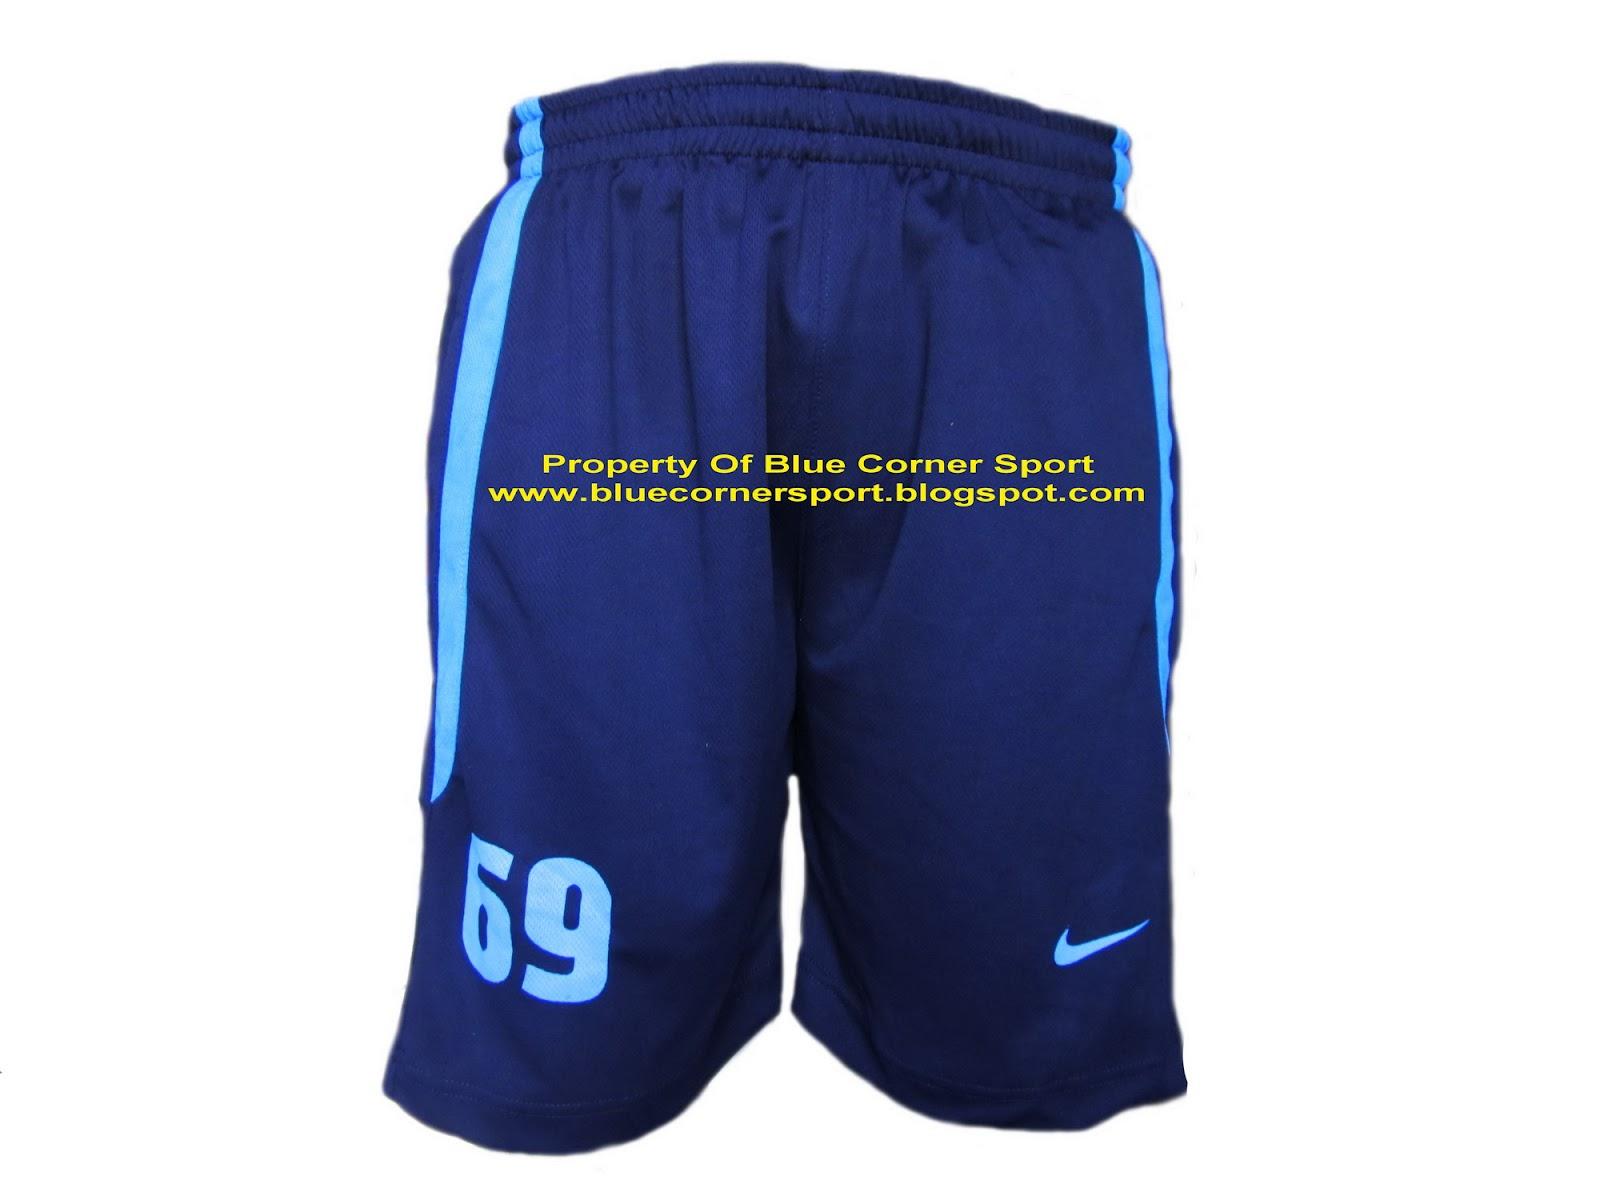 Contoh Artikel Olahraga Futsal Contoh Proposal Dana Kegiatan Slideshare Artikel Tentang Contoh Kostum Futsal Adidas Yang Ada Di Belfendwebid